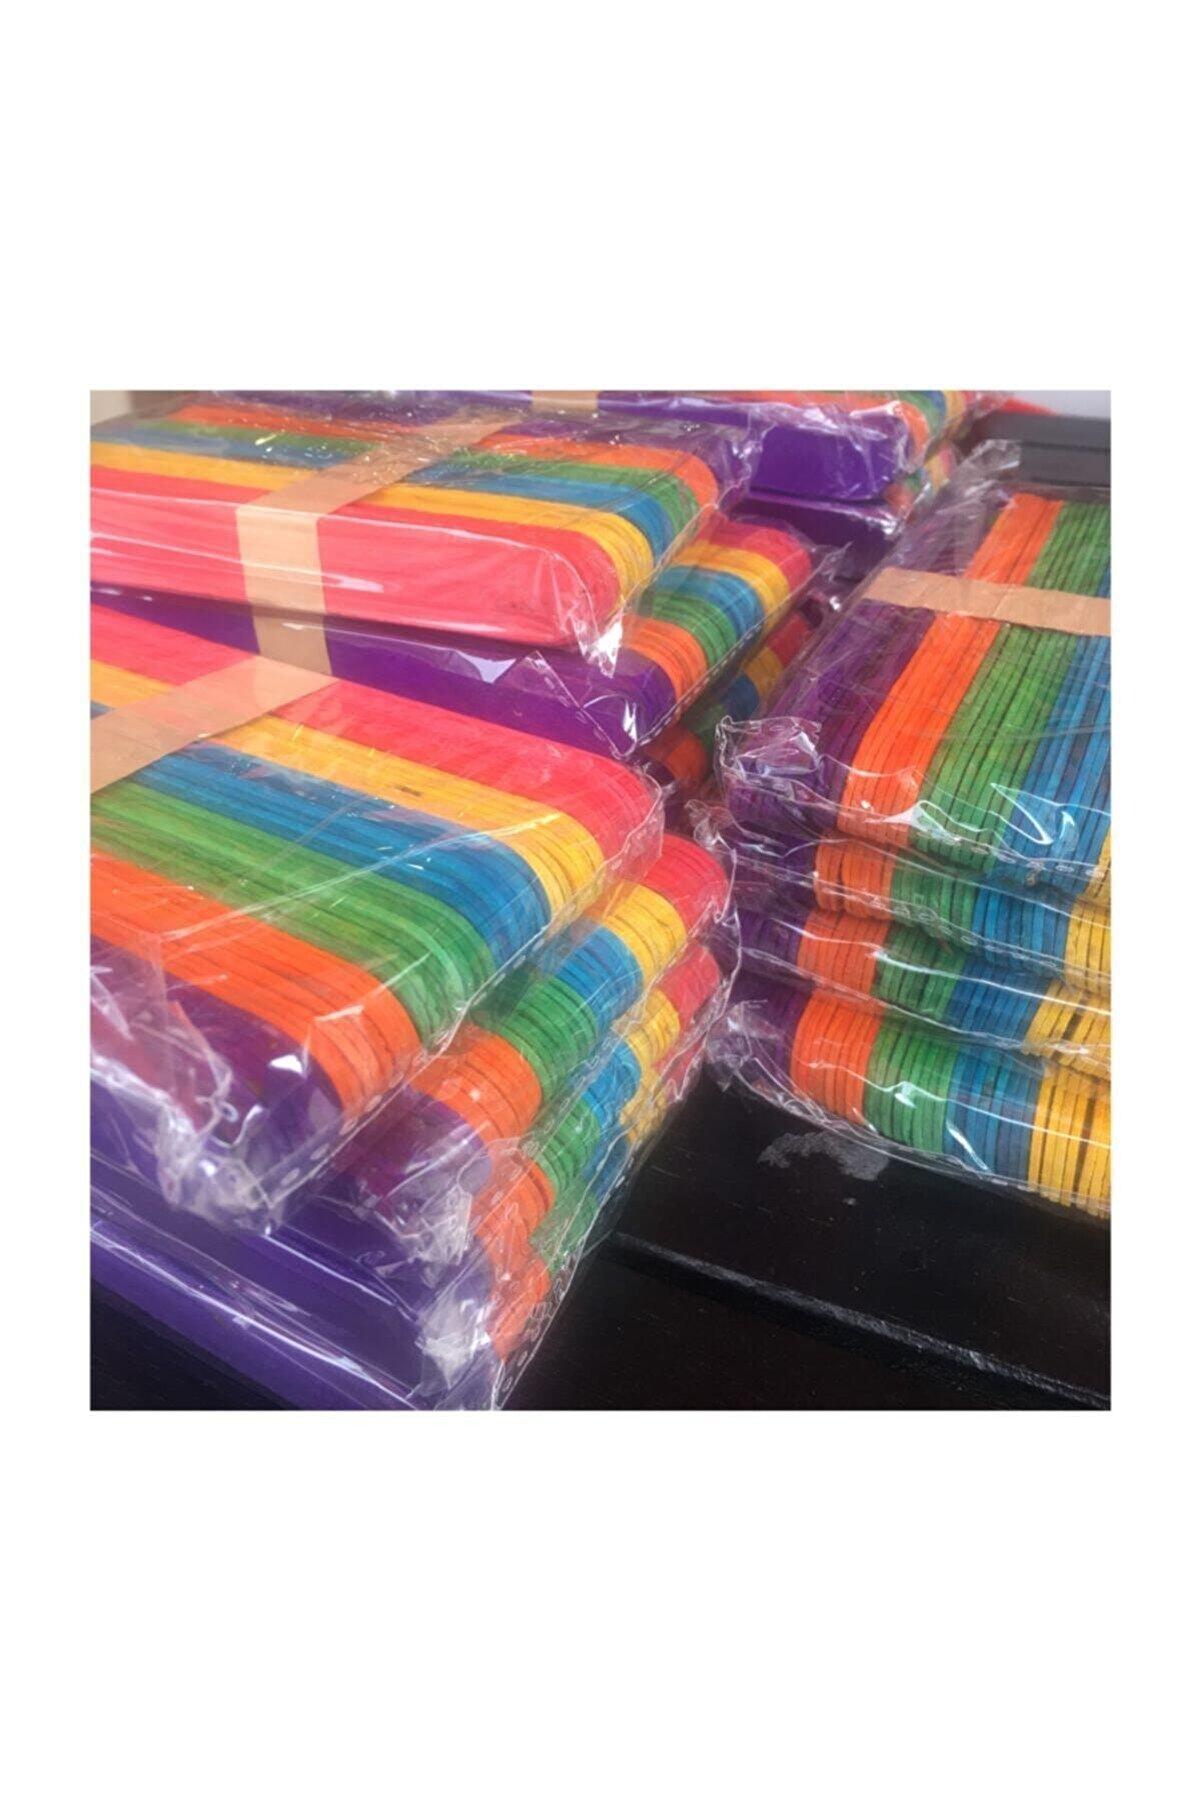 Zirve Renkli Ahşap Dil Çubuğu Abeslang Büyük Geniş 50li Çx